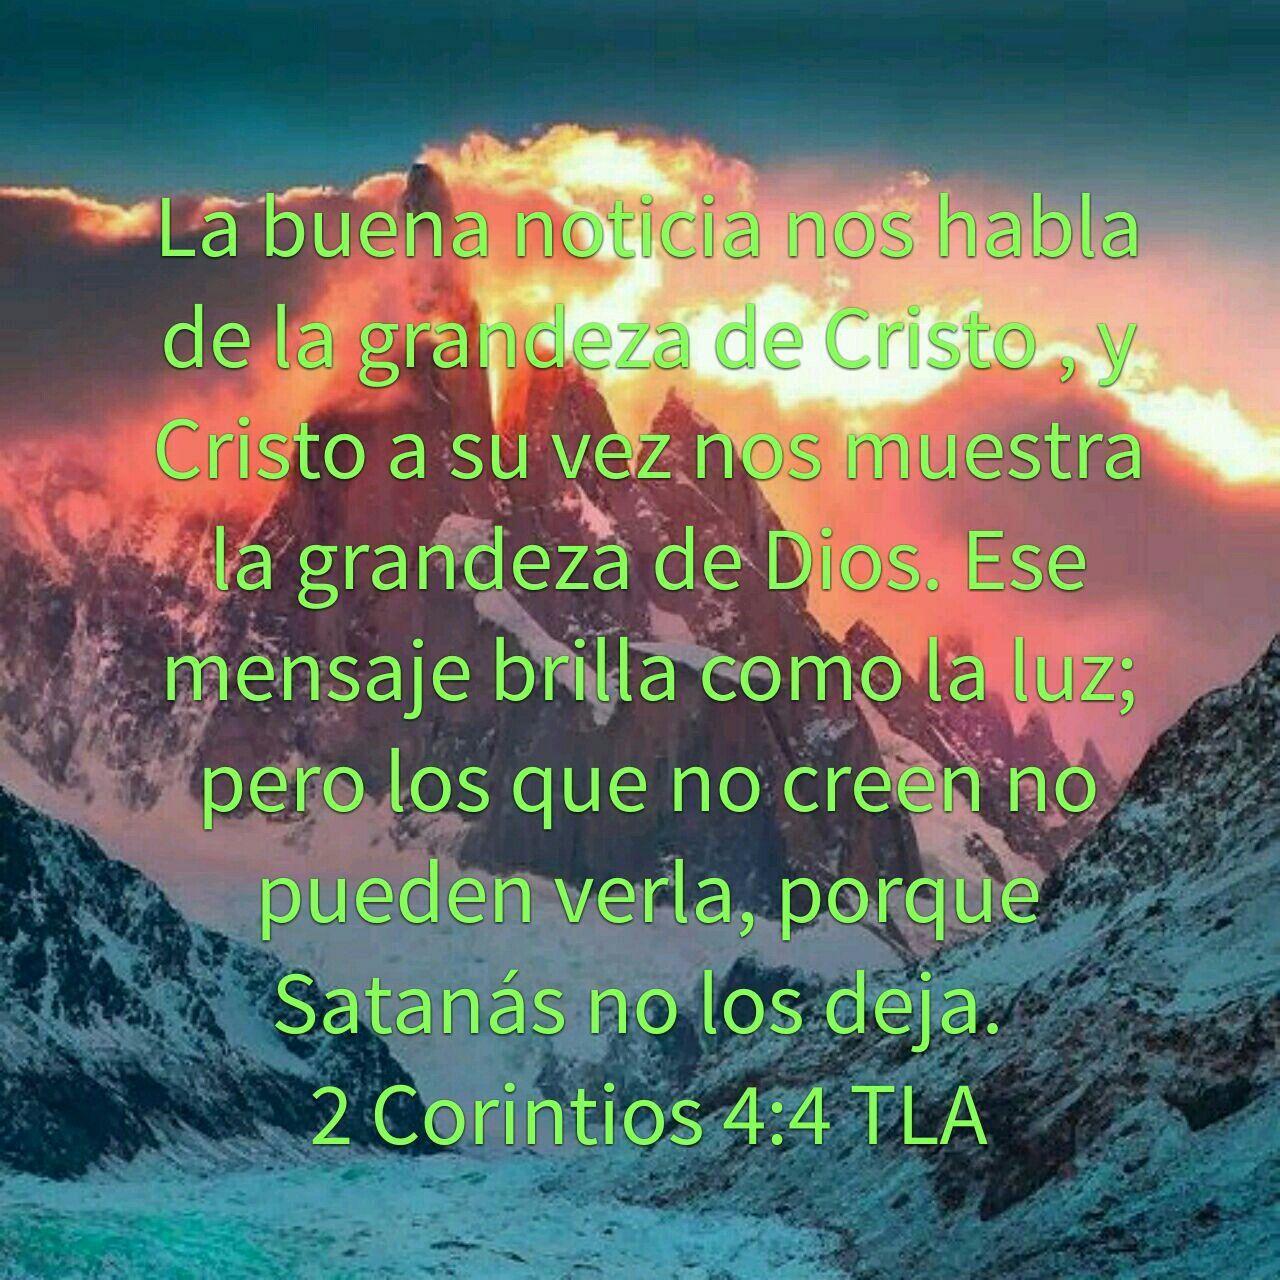 2 Corintios 4:4 | Bienaventurados | Pinterest